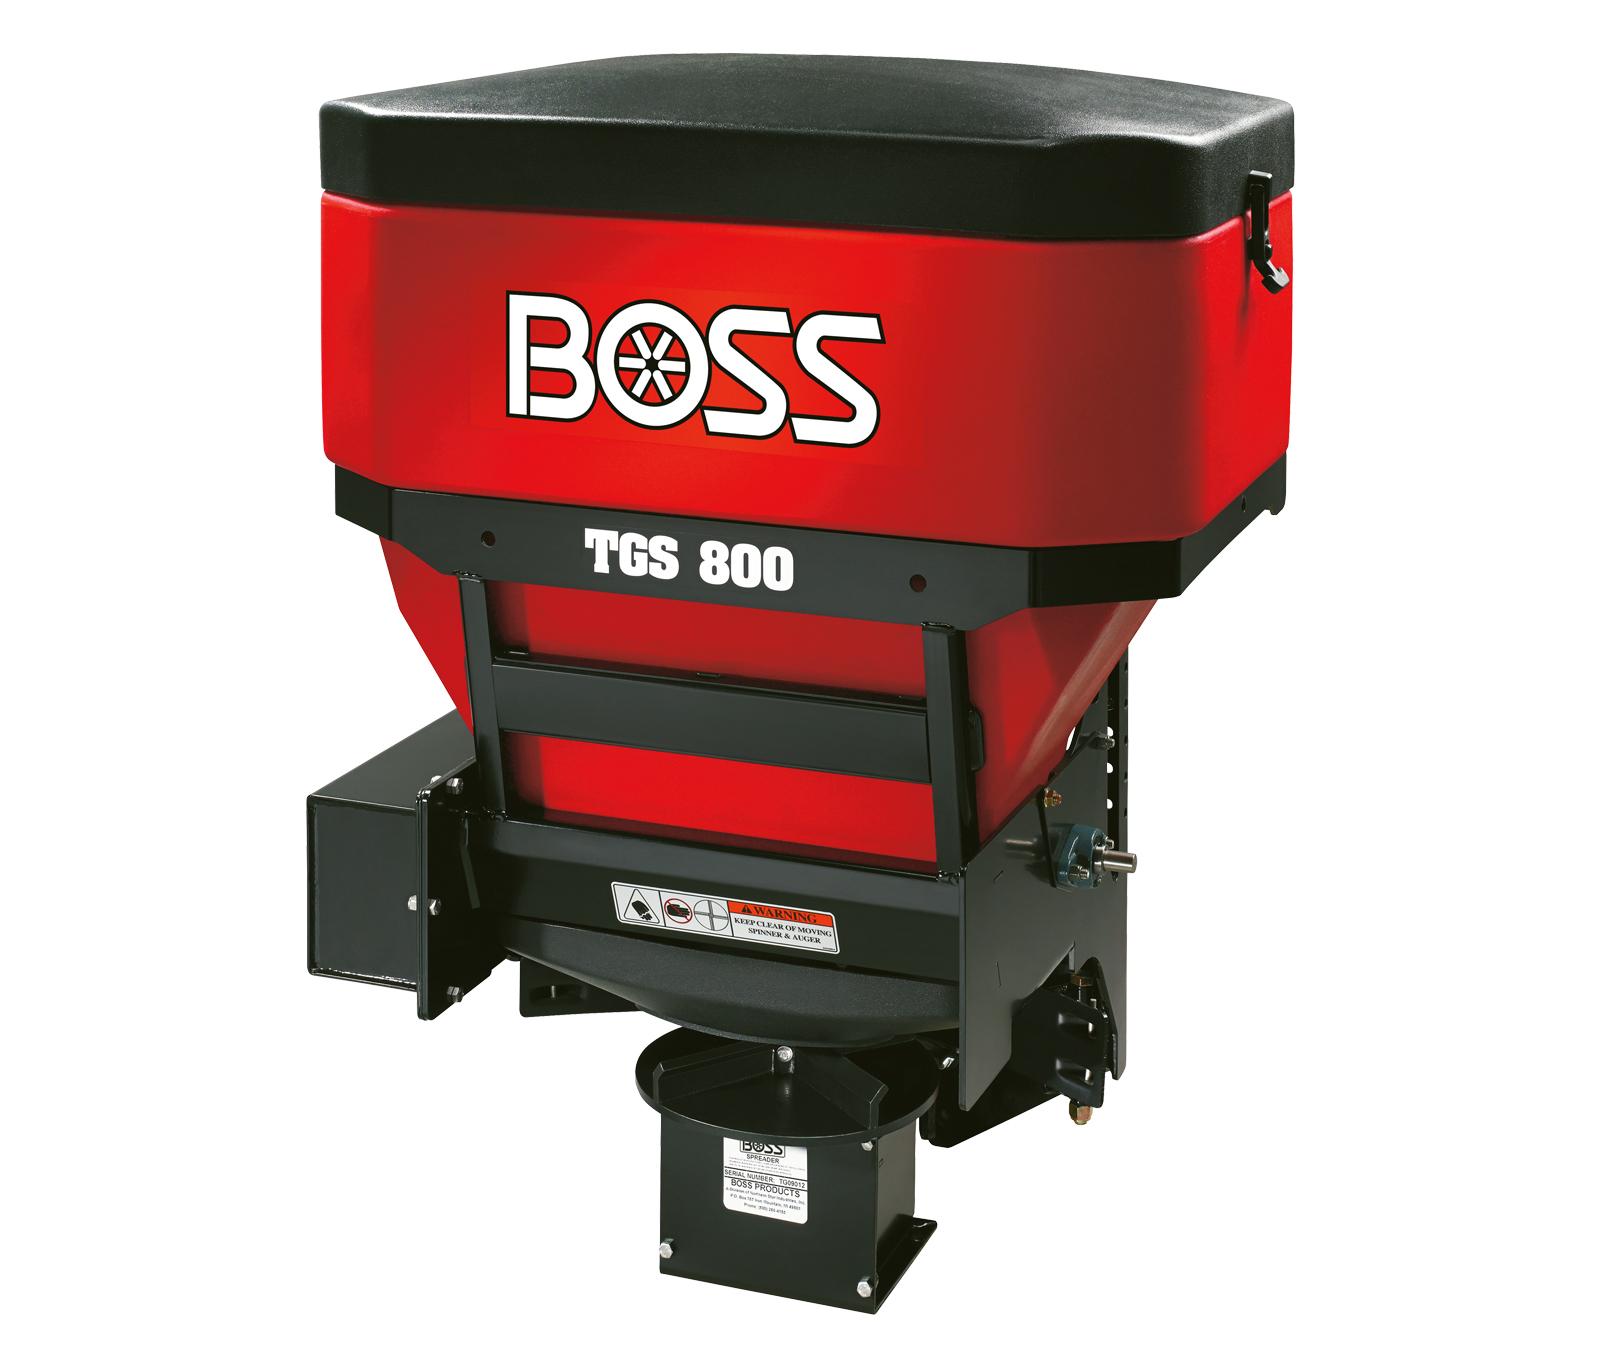 tailgatespreader800polyfront.ashx?mw=700&mh=599&hash=8B2935A9000AE2F333E660E00616AC509B187DA7 boss snowplow tailgate spreaders, salt spreader, sand spreader Boss Plow Wiring Harness Diagram at bakdesigns.co